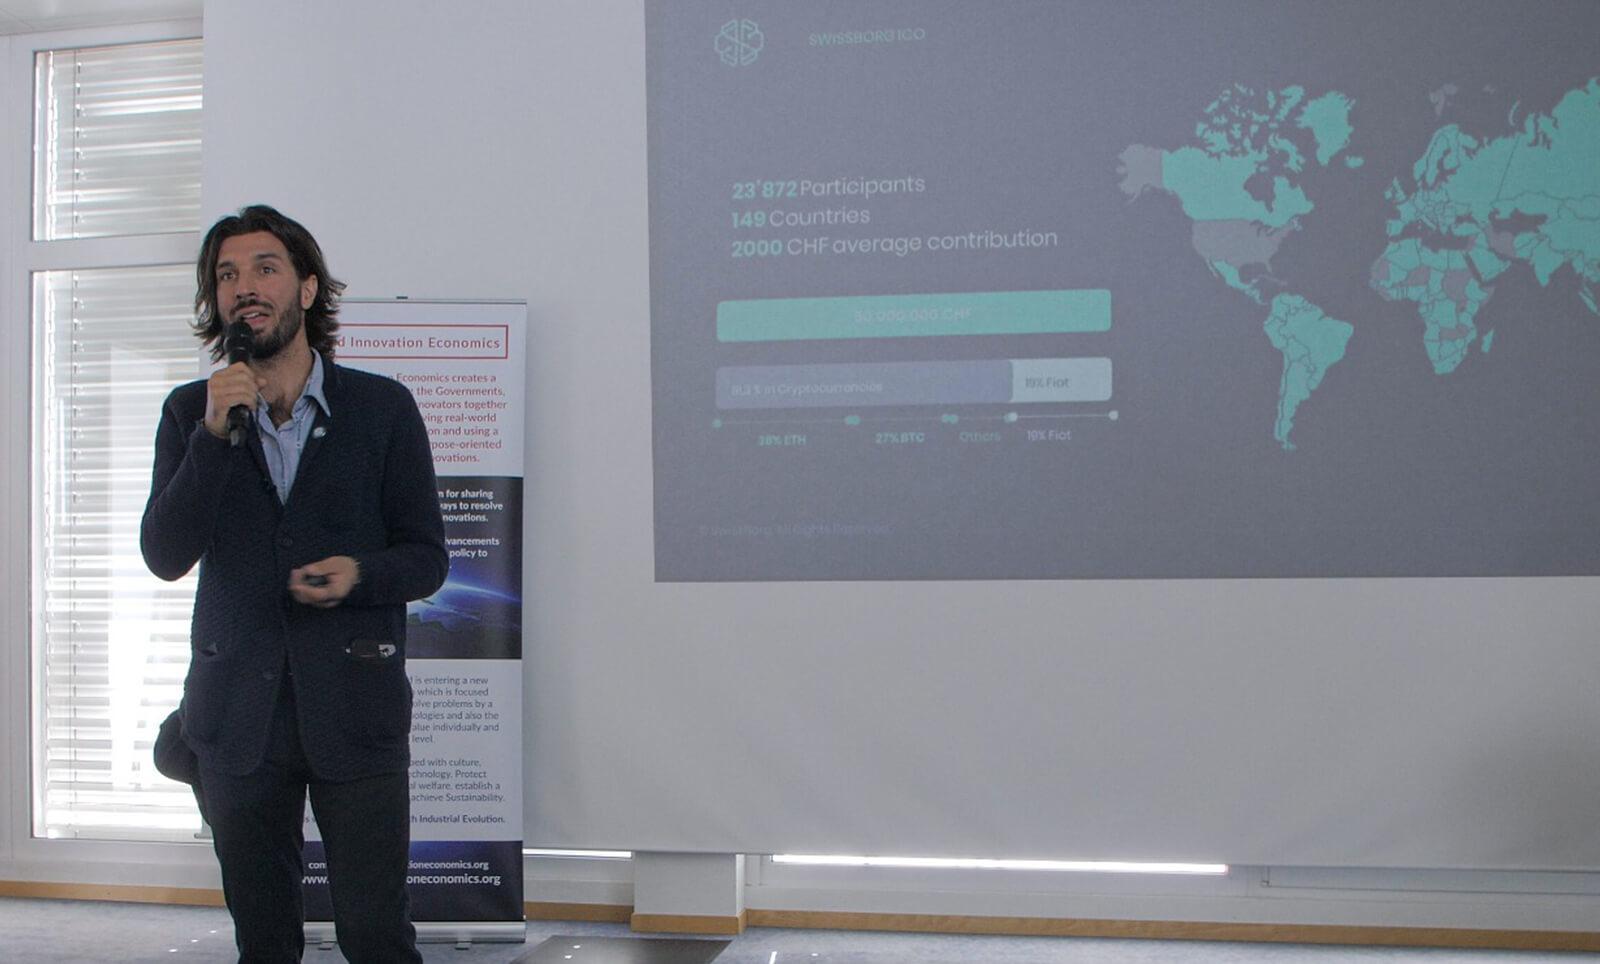 Cyrus Fazel smart engine talk at WEF in Davos